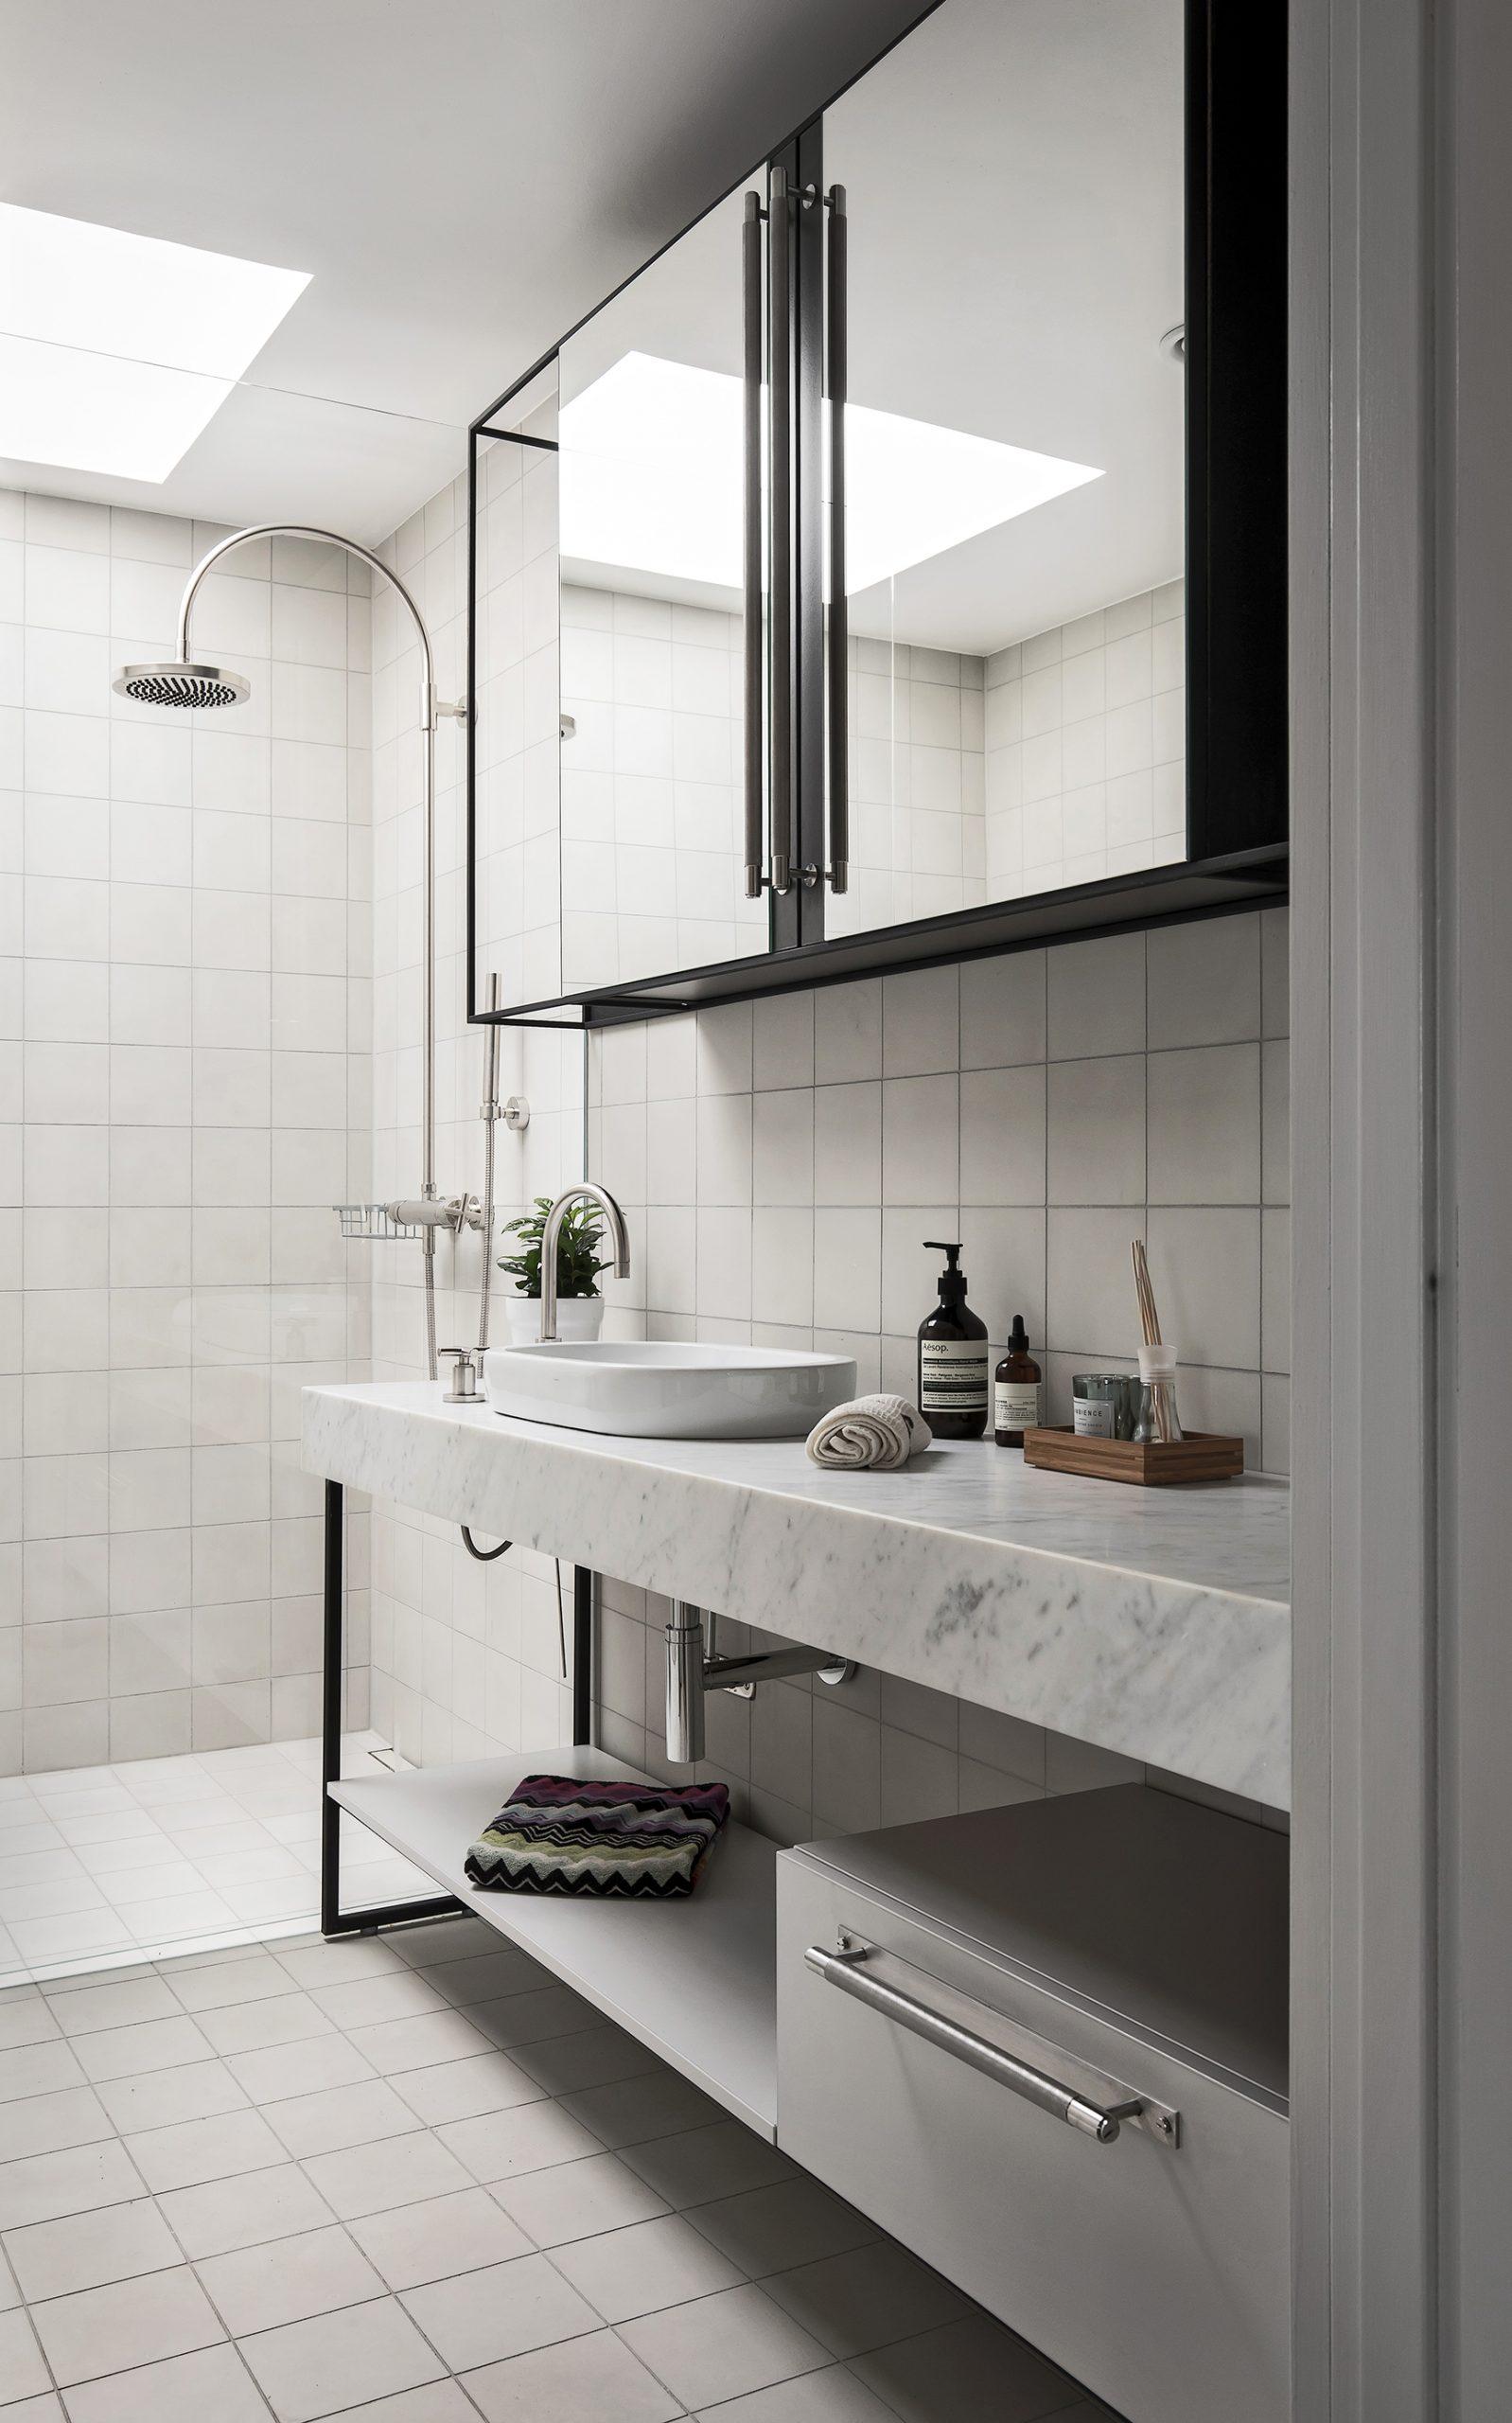 Bathroom featuring Buster + Punch Steel closet bar